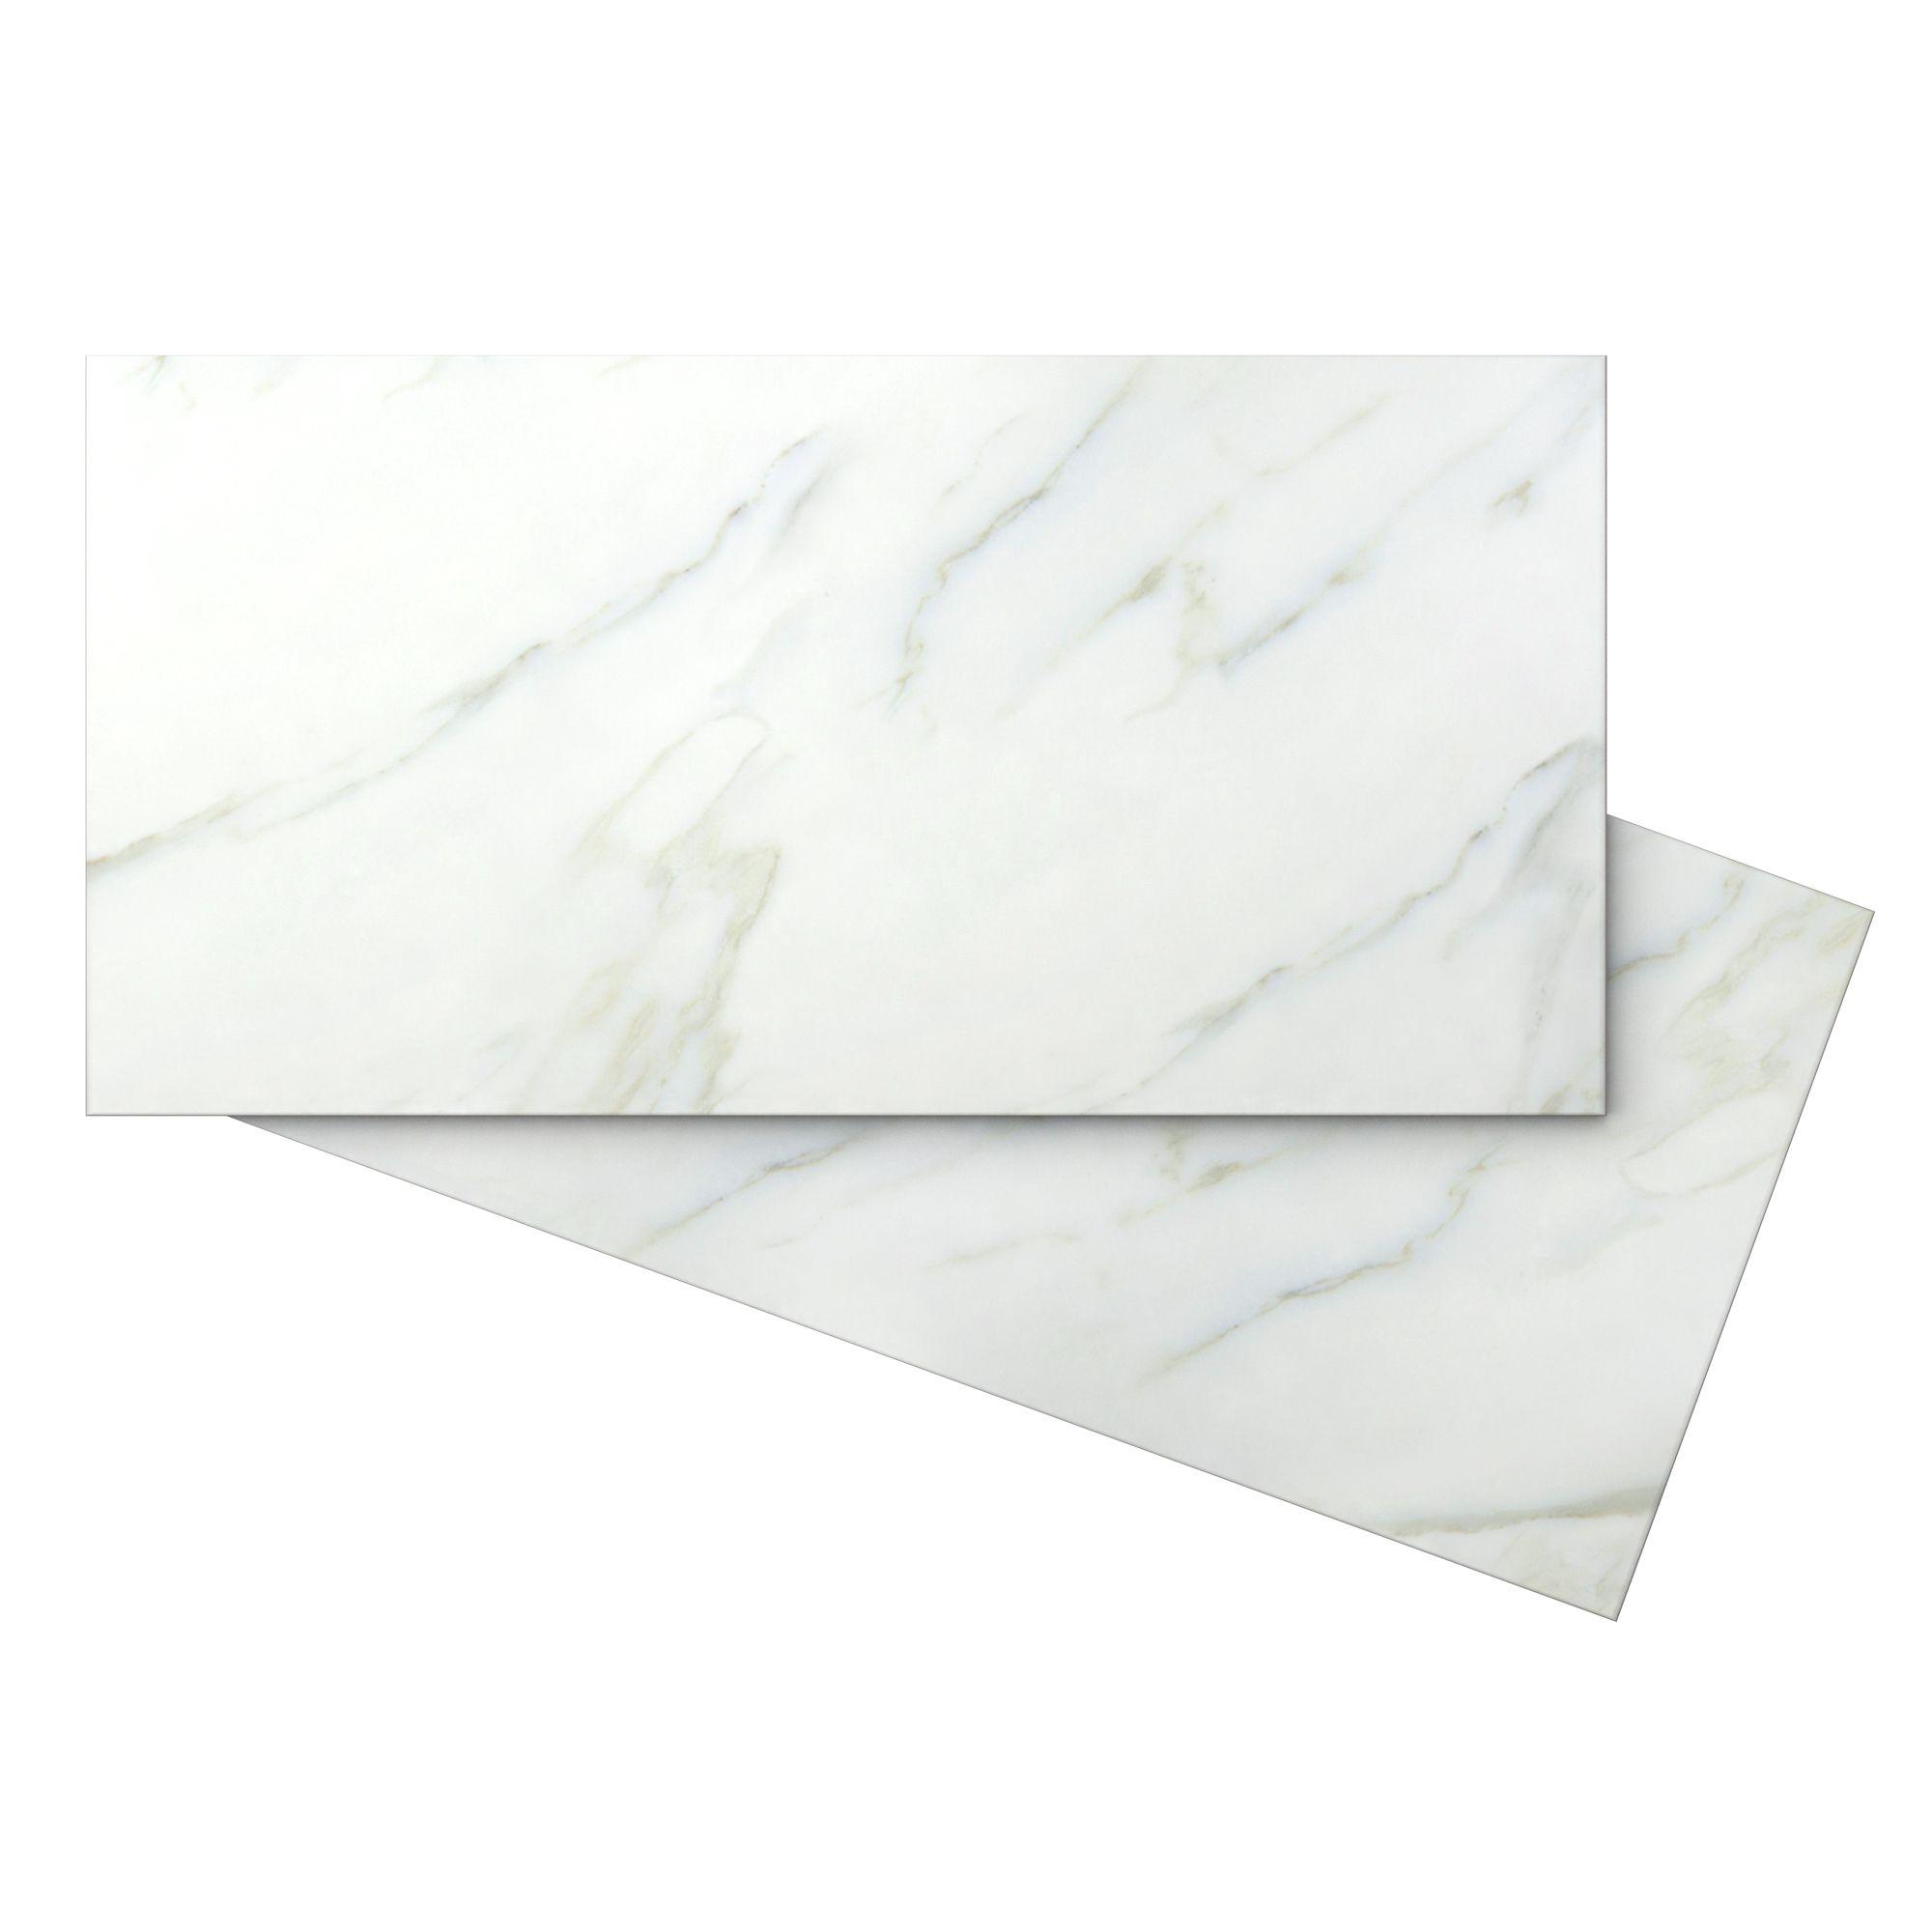 Aquila White Carrara Ceramic Wall Tile